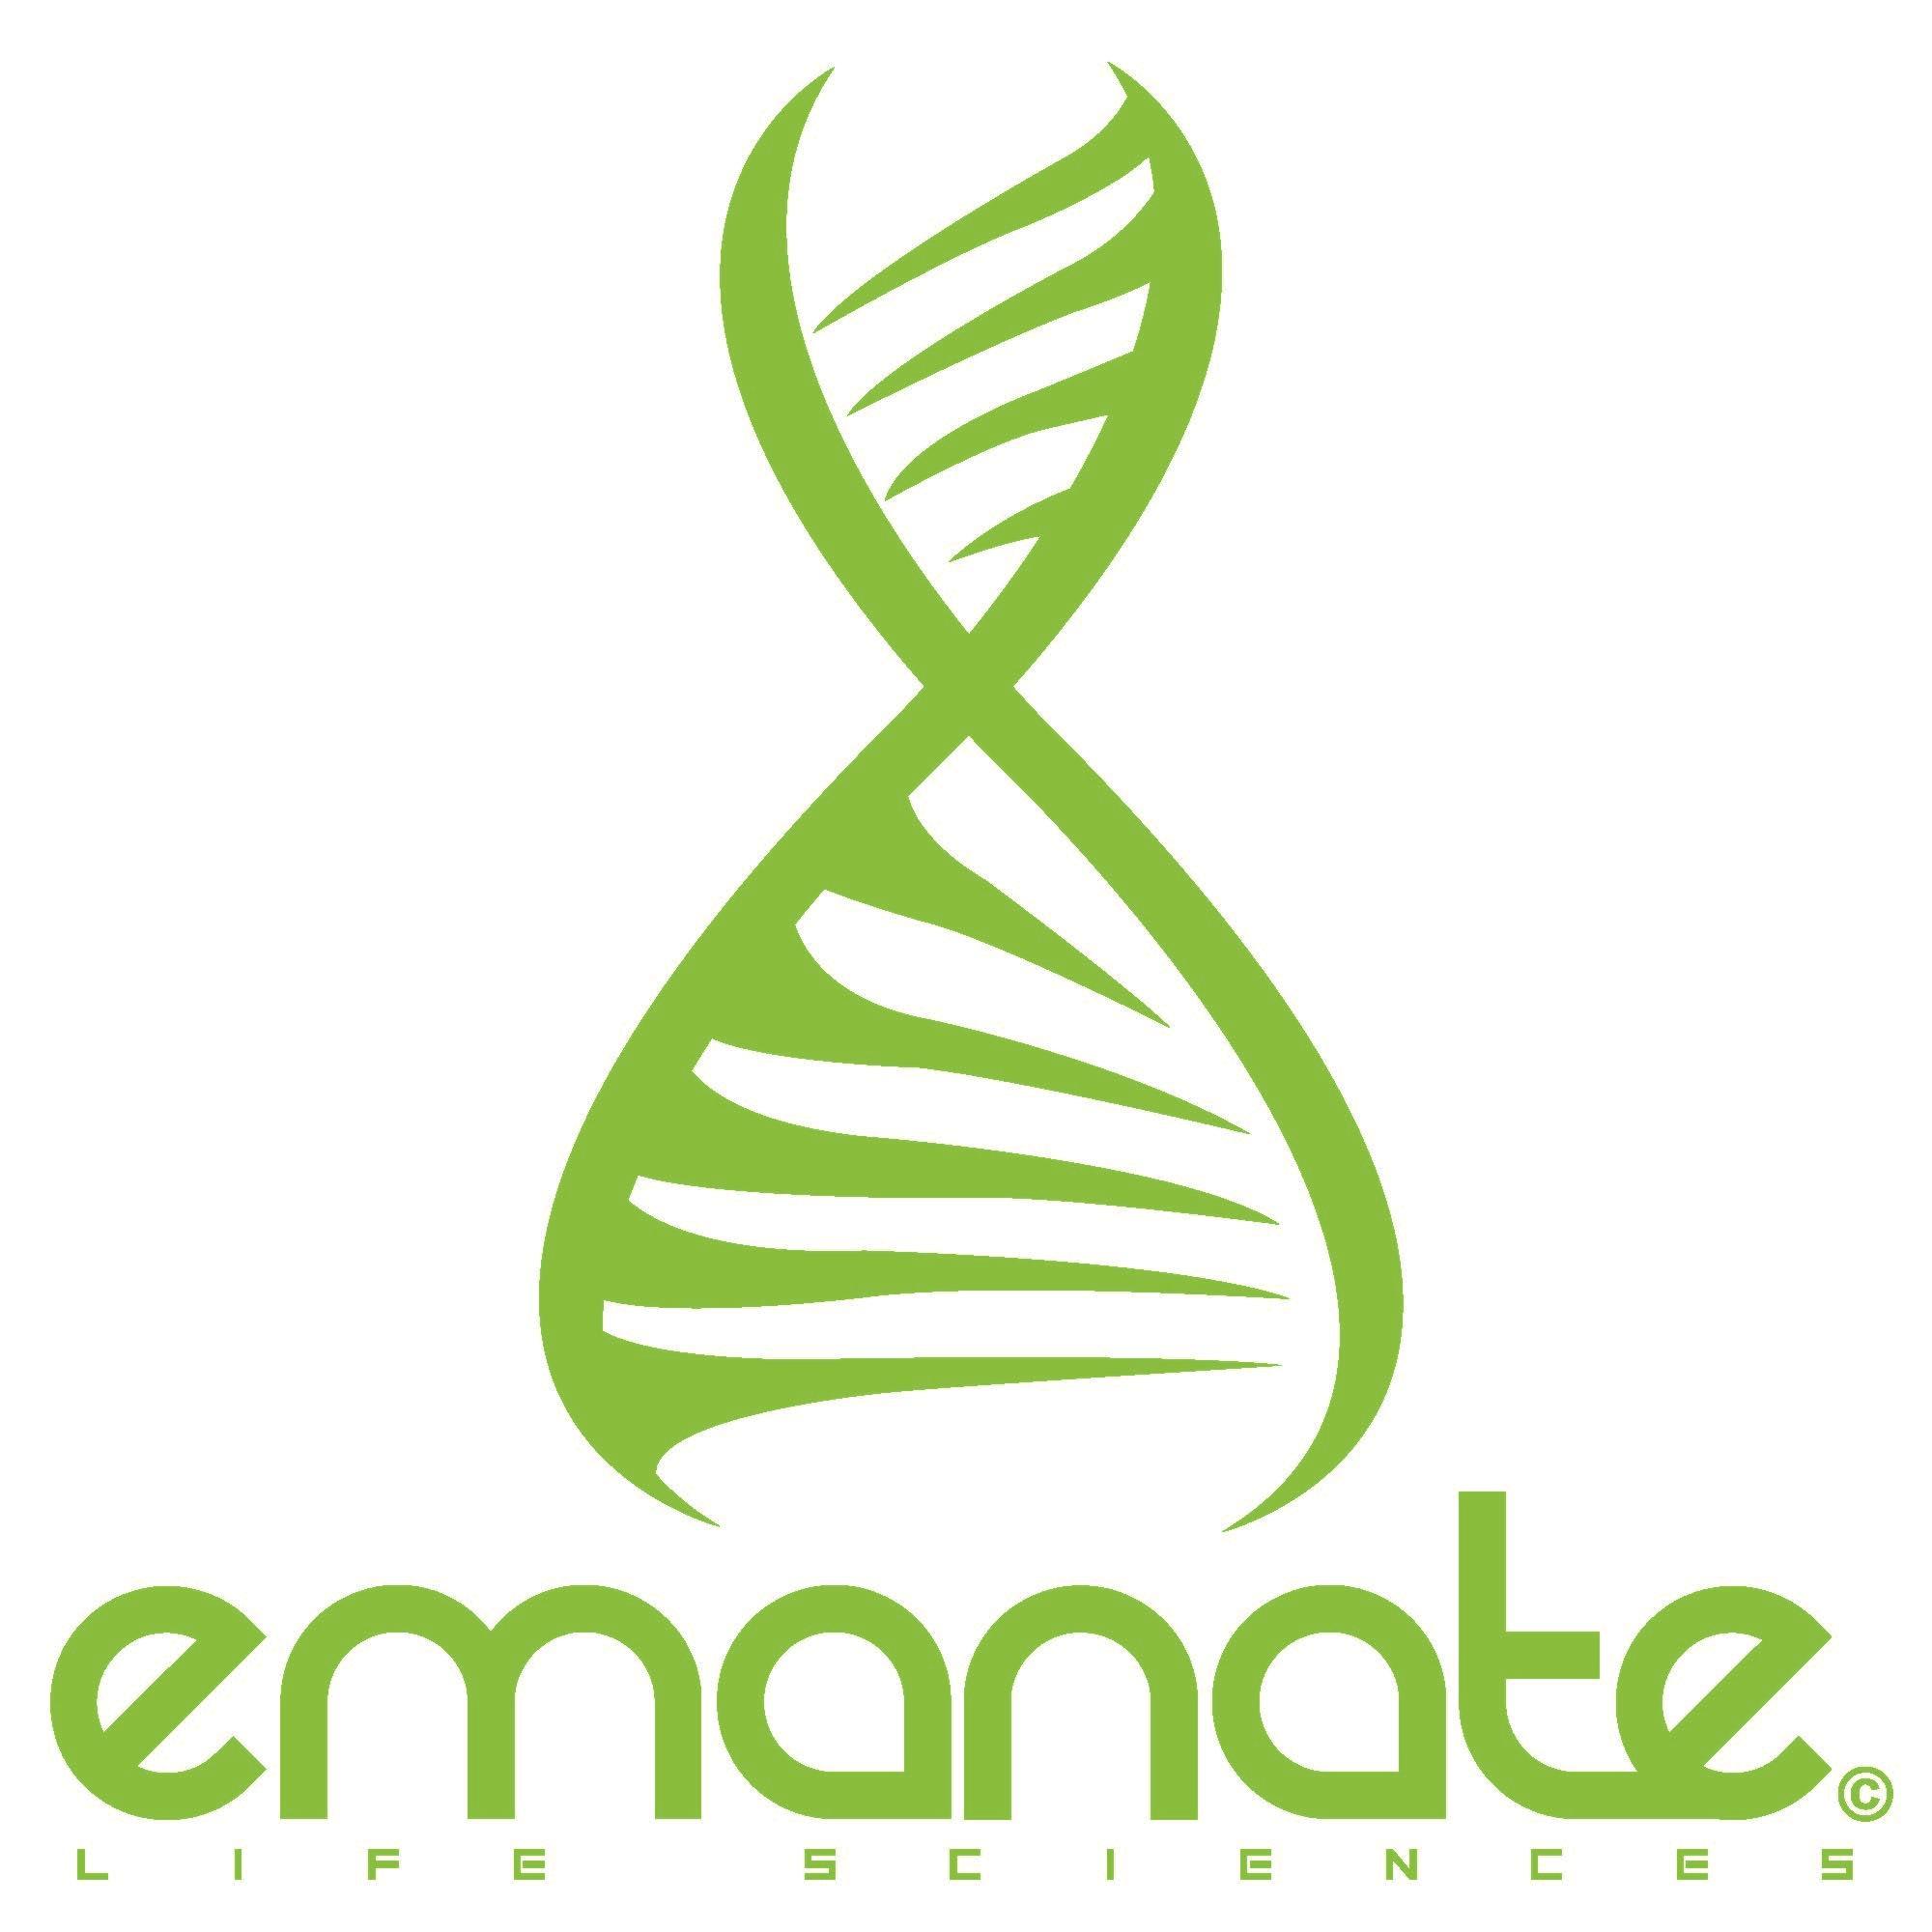 Emanate Life Sciences